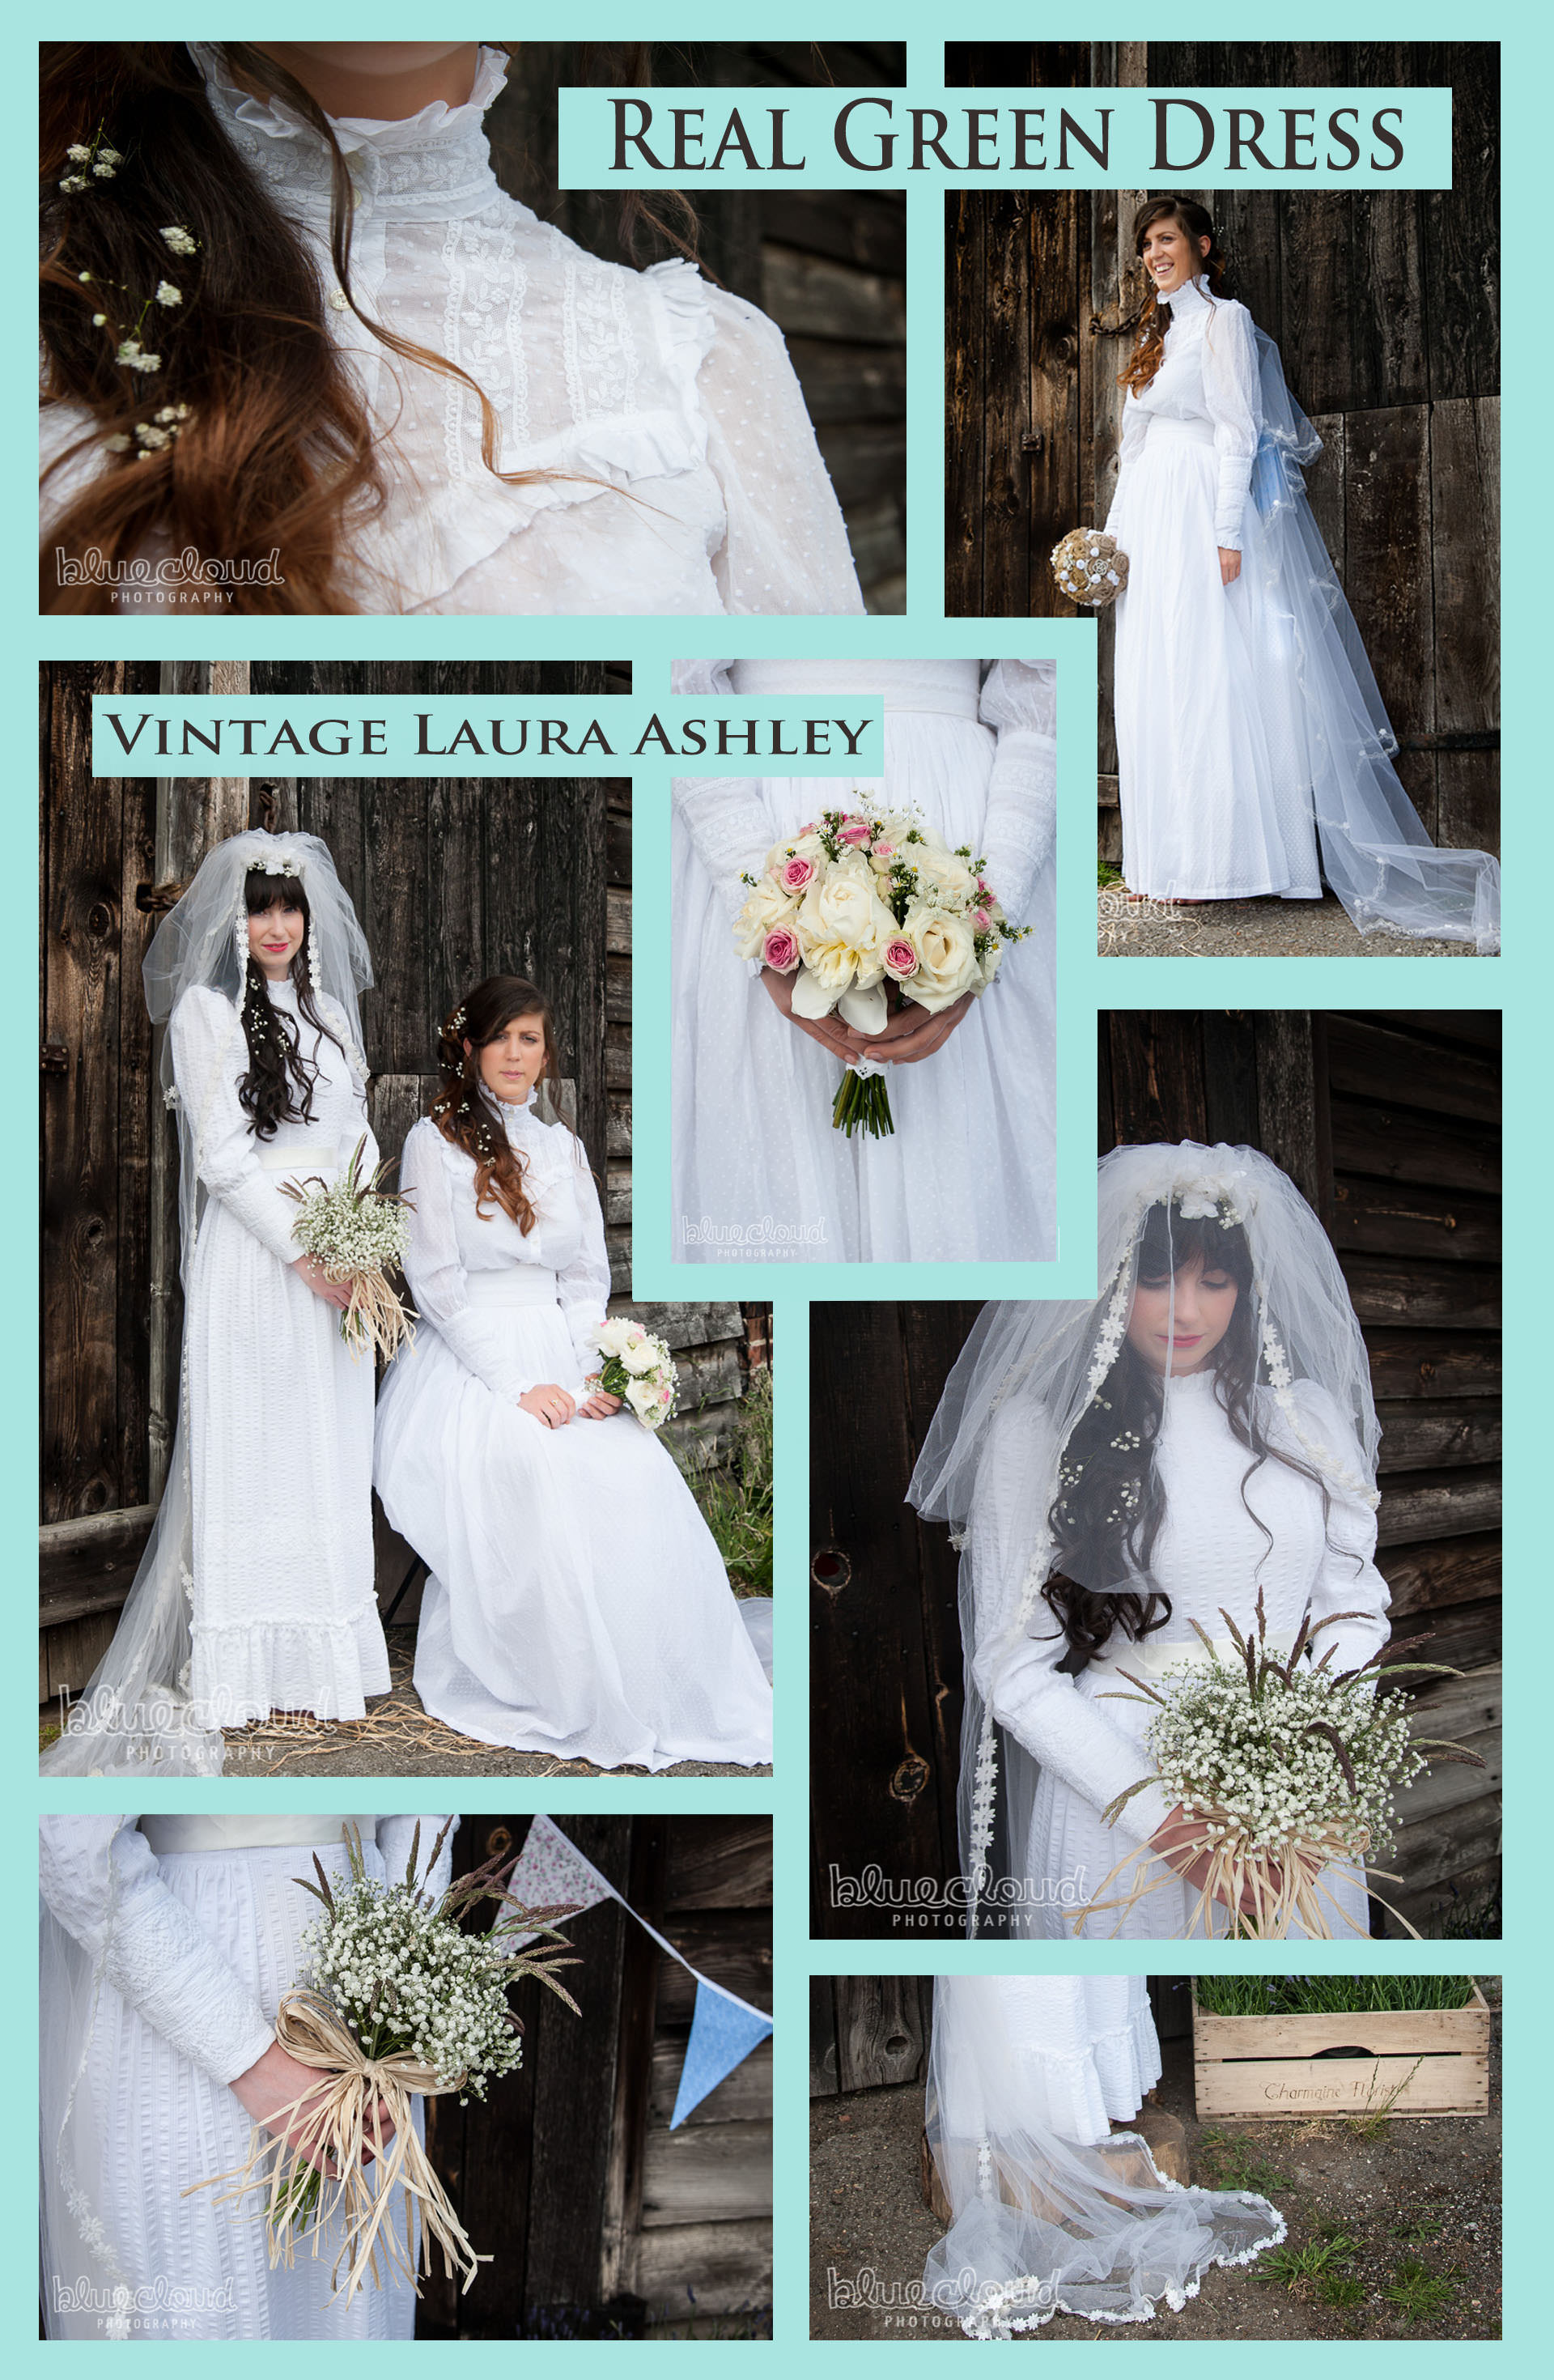 Vintage Laura Ashley Wedding Dresses X 2! | Vintage and Ethical ...